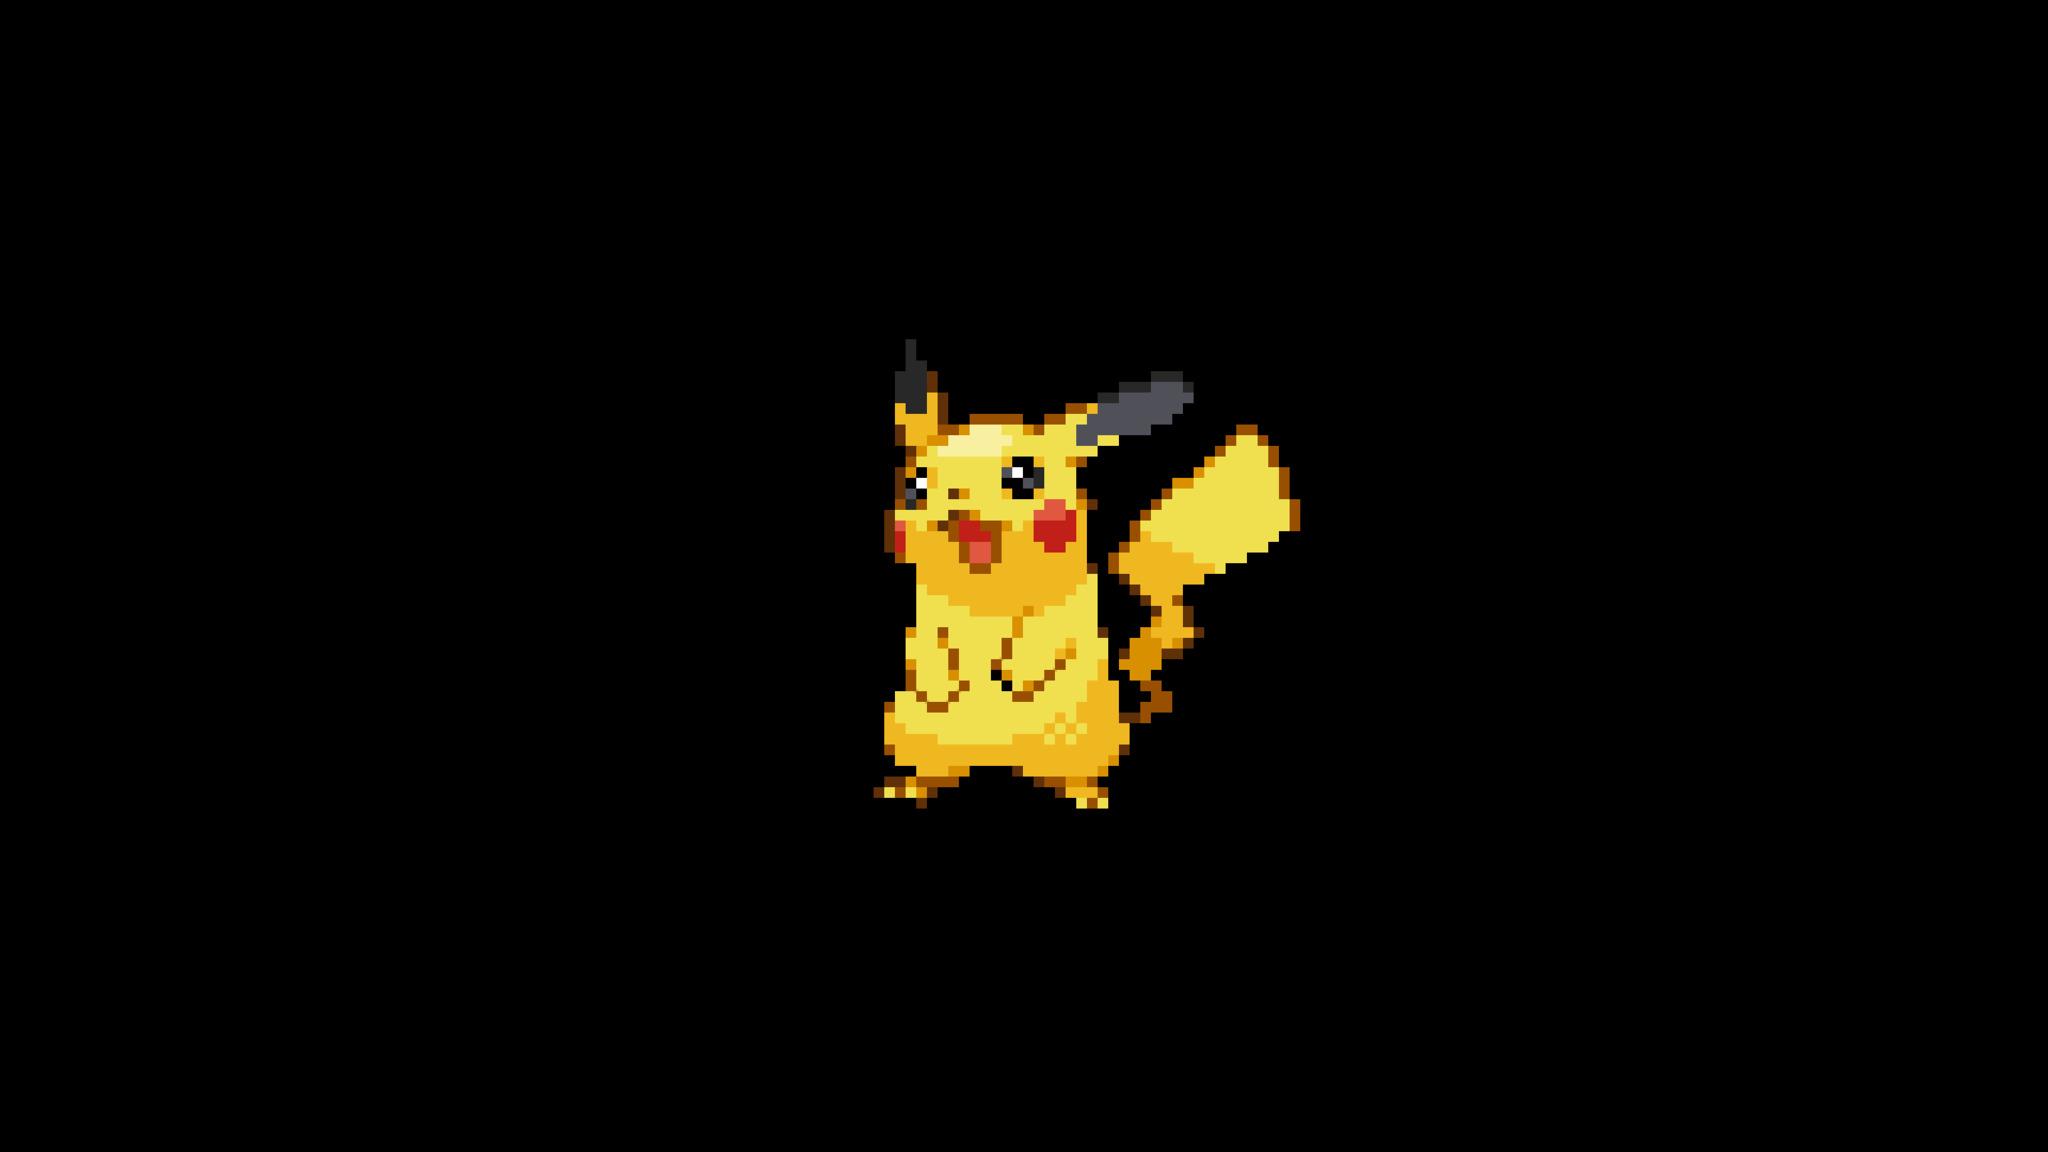 Pokemon Pictures That Are 2048 By 1152 Pixels: 2048x1152 Pokemon 8 Bit Minimalism 2048x1152 Resolution HD